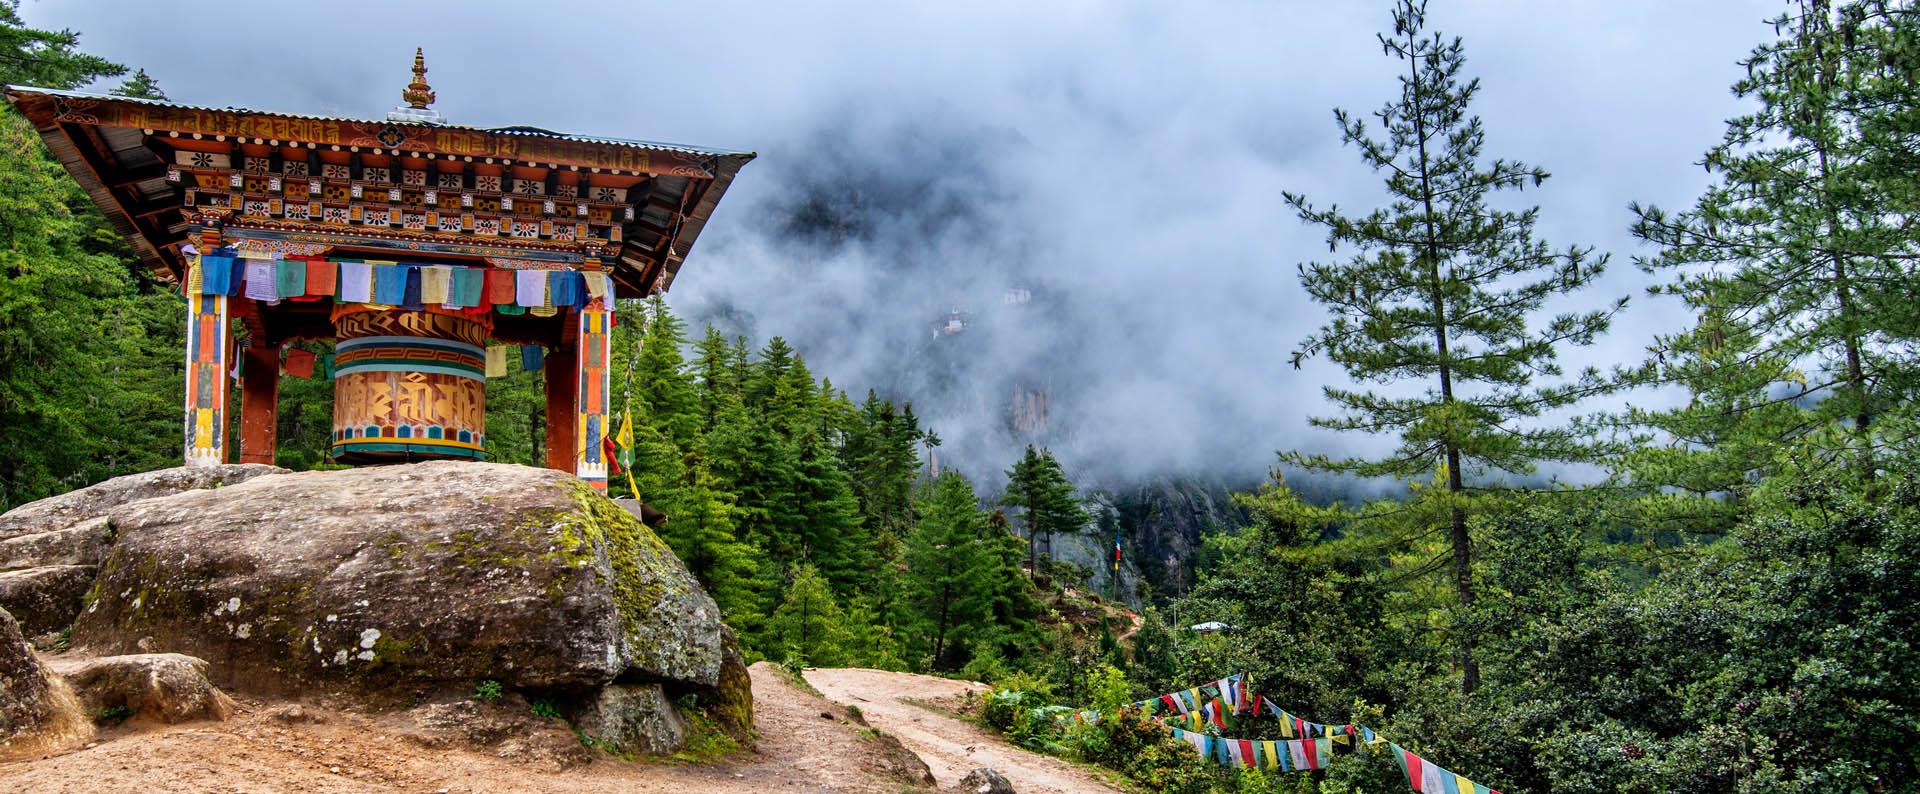 tu guía de viaje a Bután, himalaya